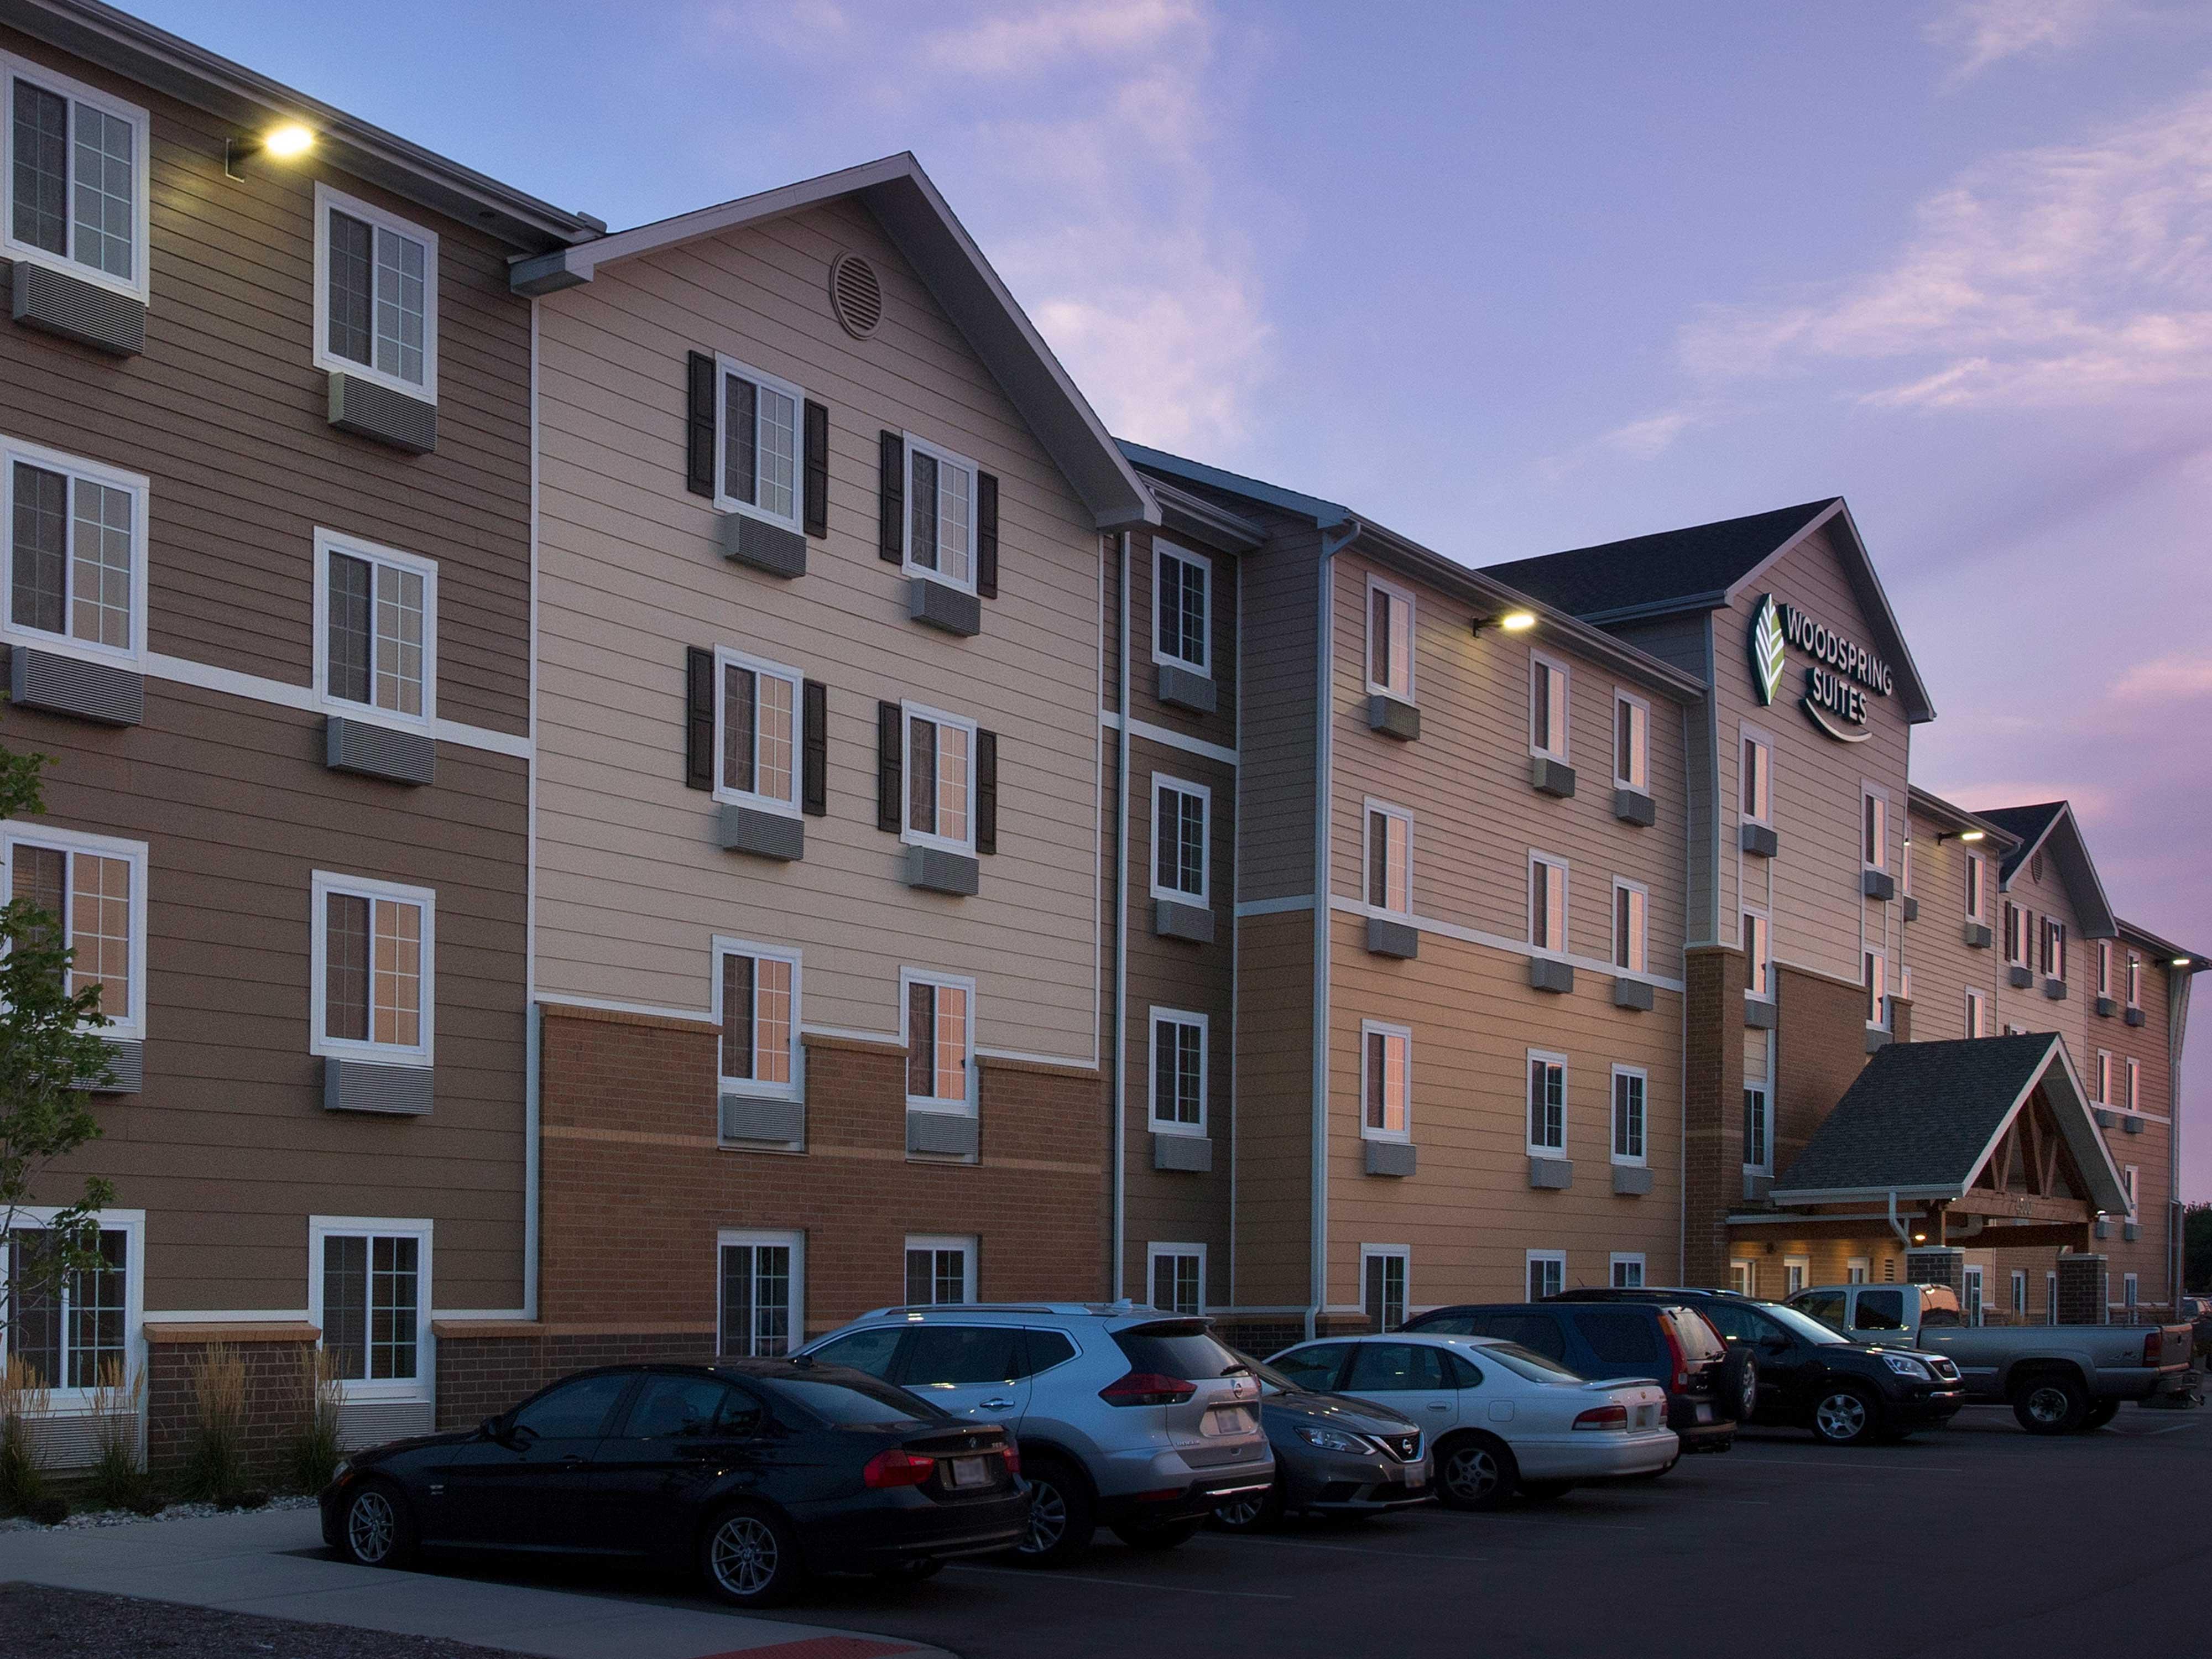 WoodSpring Suites Grand Rapids South image 17